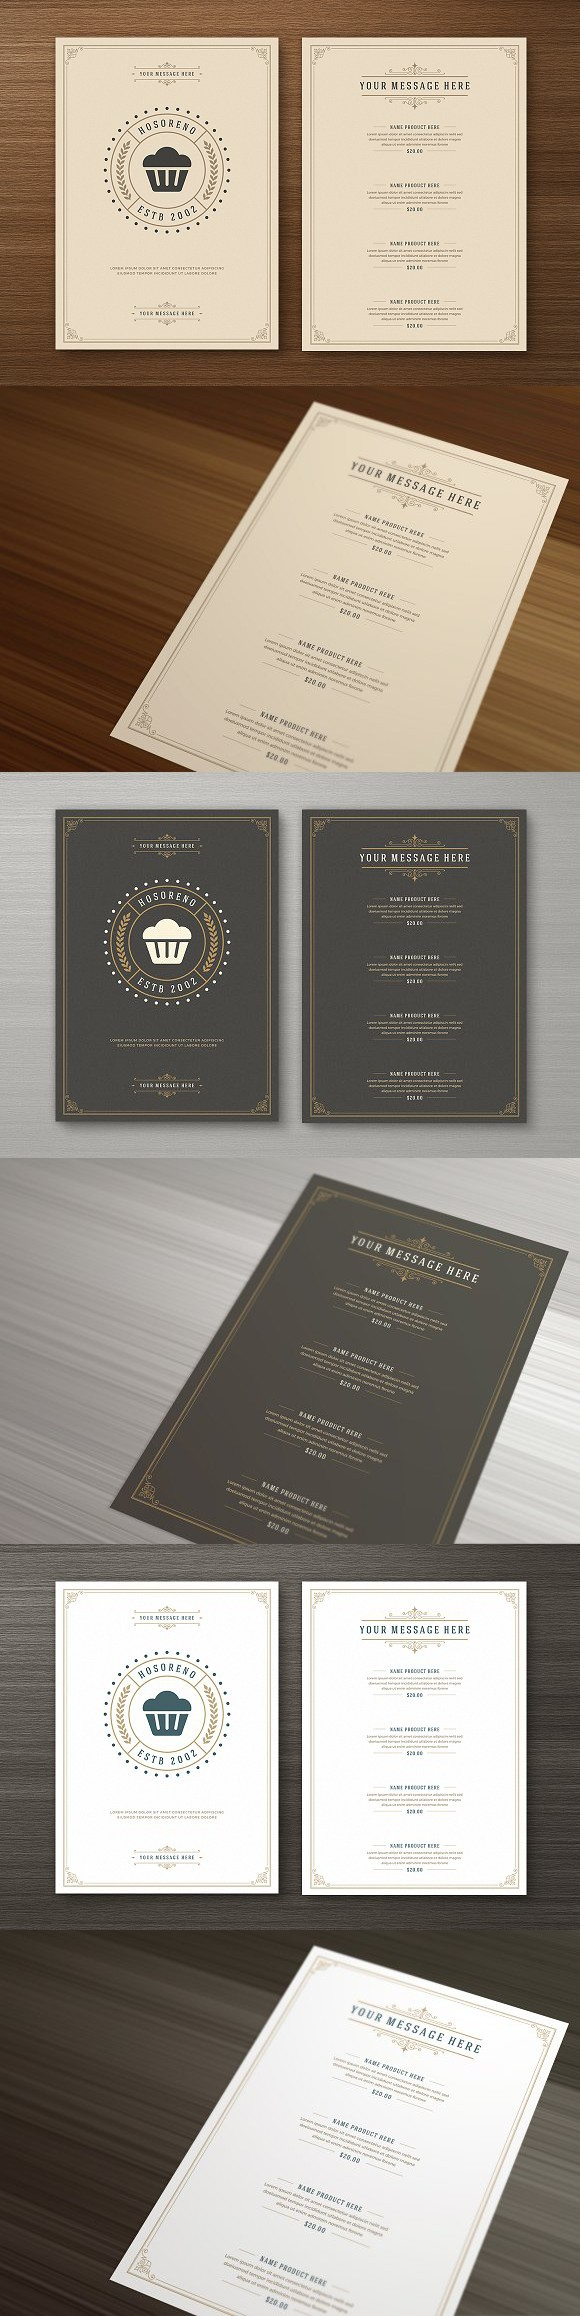 Restaurant Menu with Logo Design. Brochure Templates